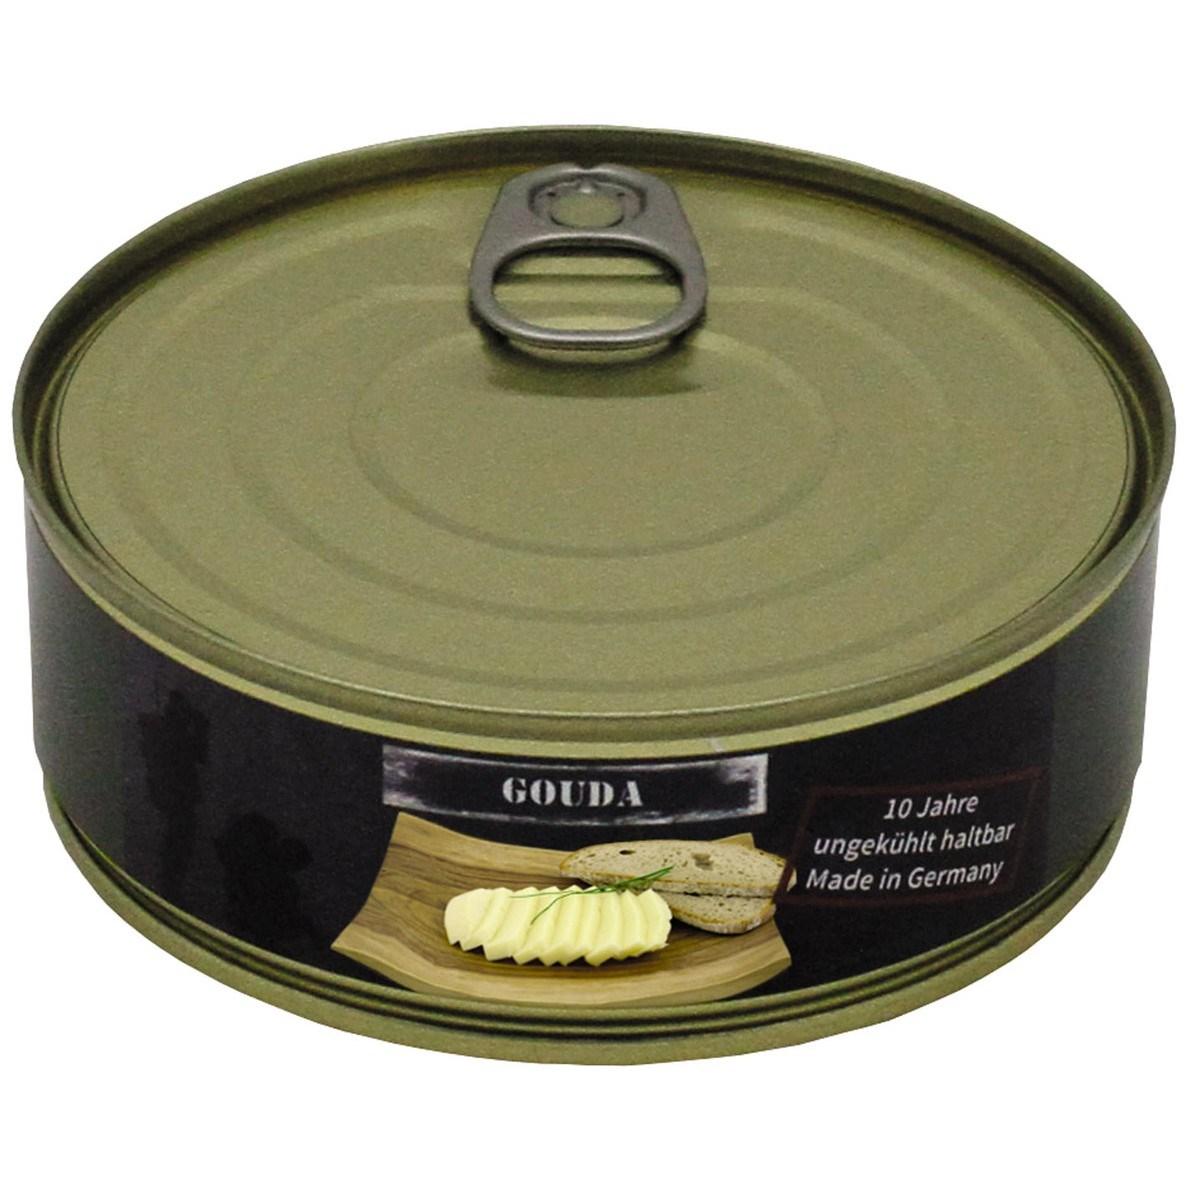 Sýr GOUDA v plechovce 200g - zvìtšit obrázek